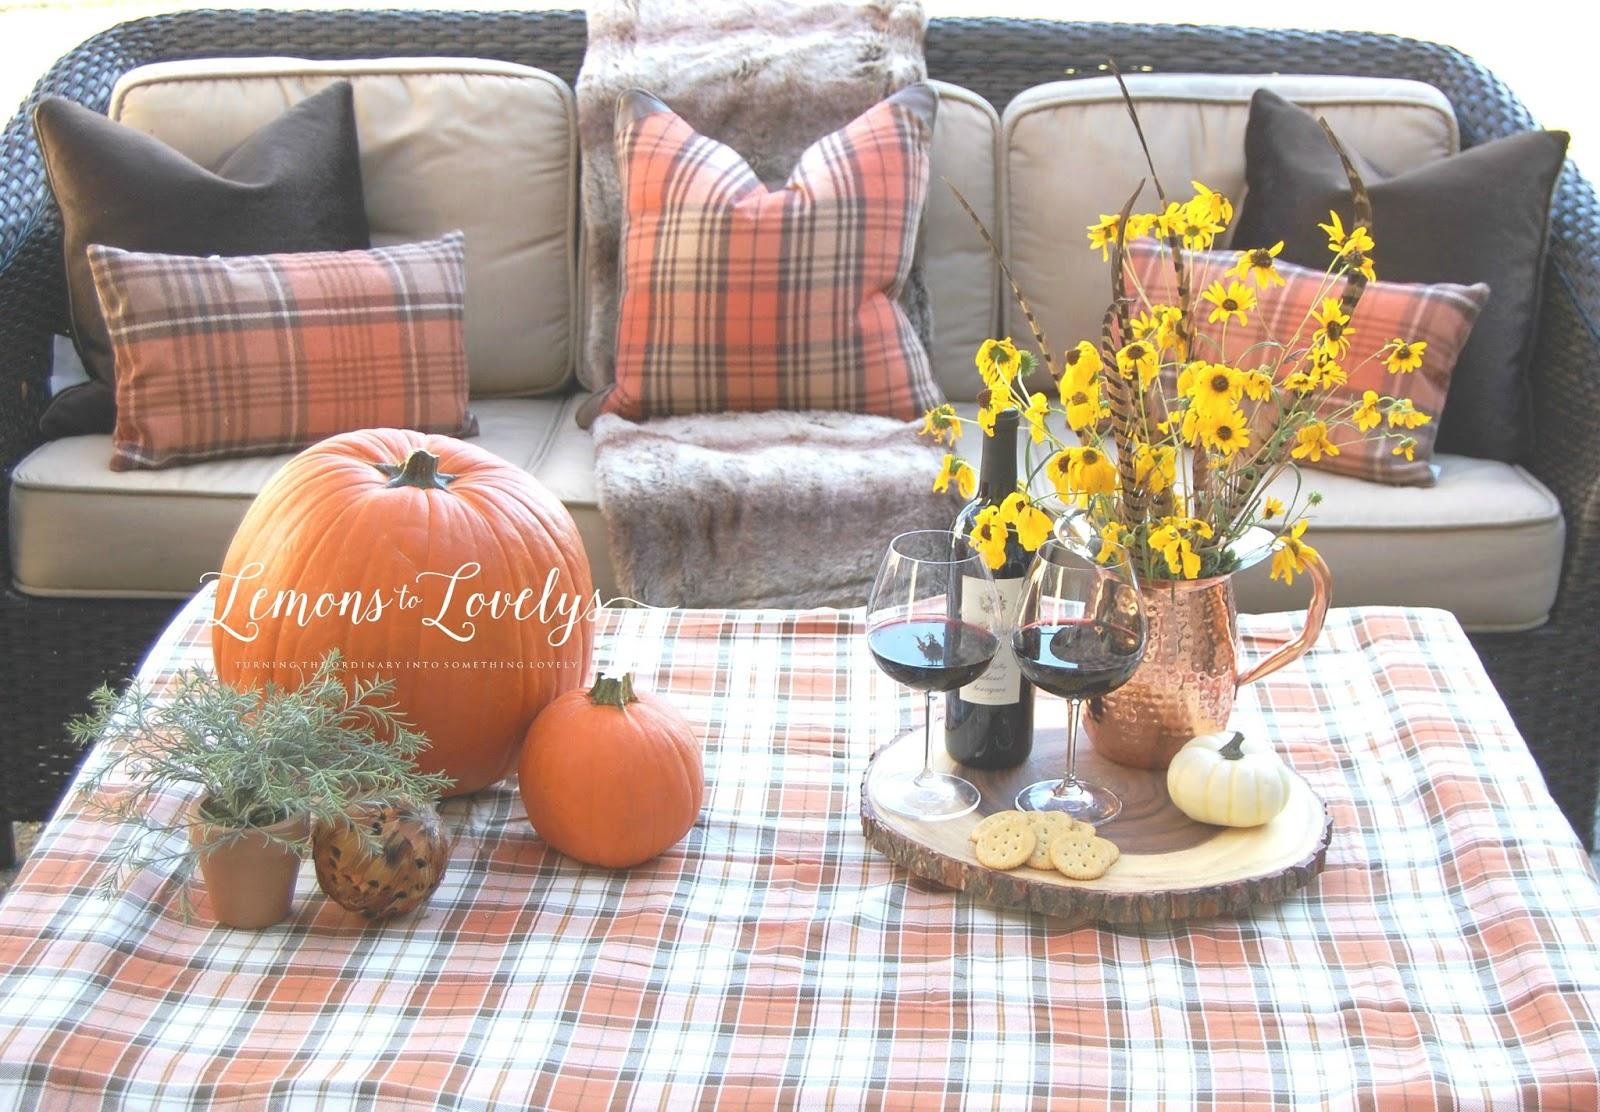 pillows fur blanket tablecloth wood tray copper white pumpkin u0026 pheasant lobby decorative feather ballpier1